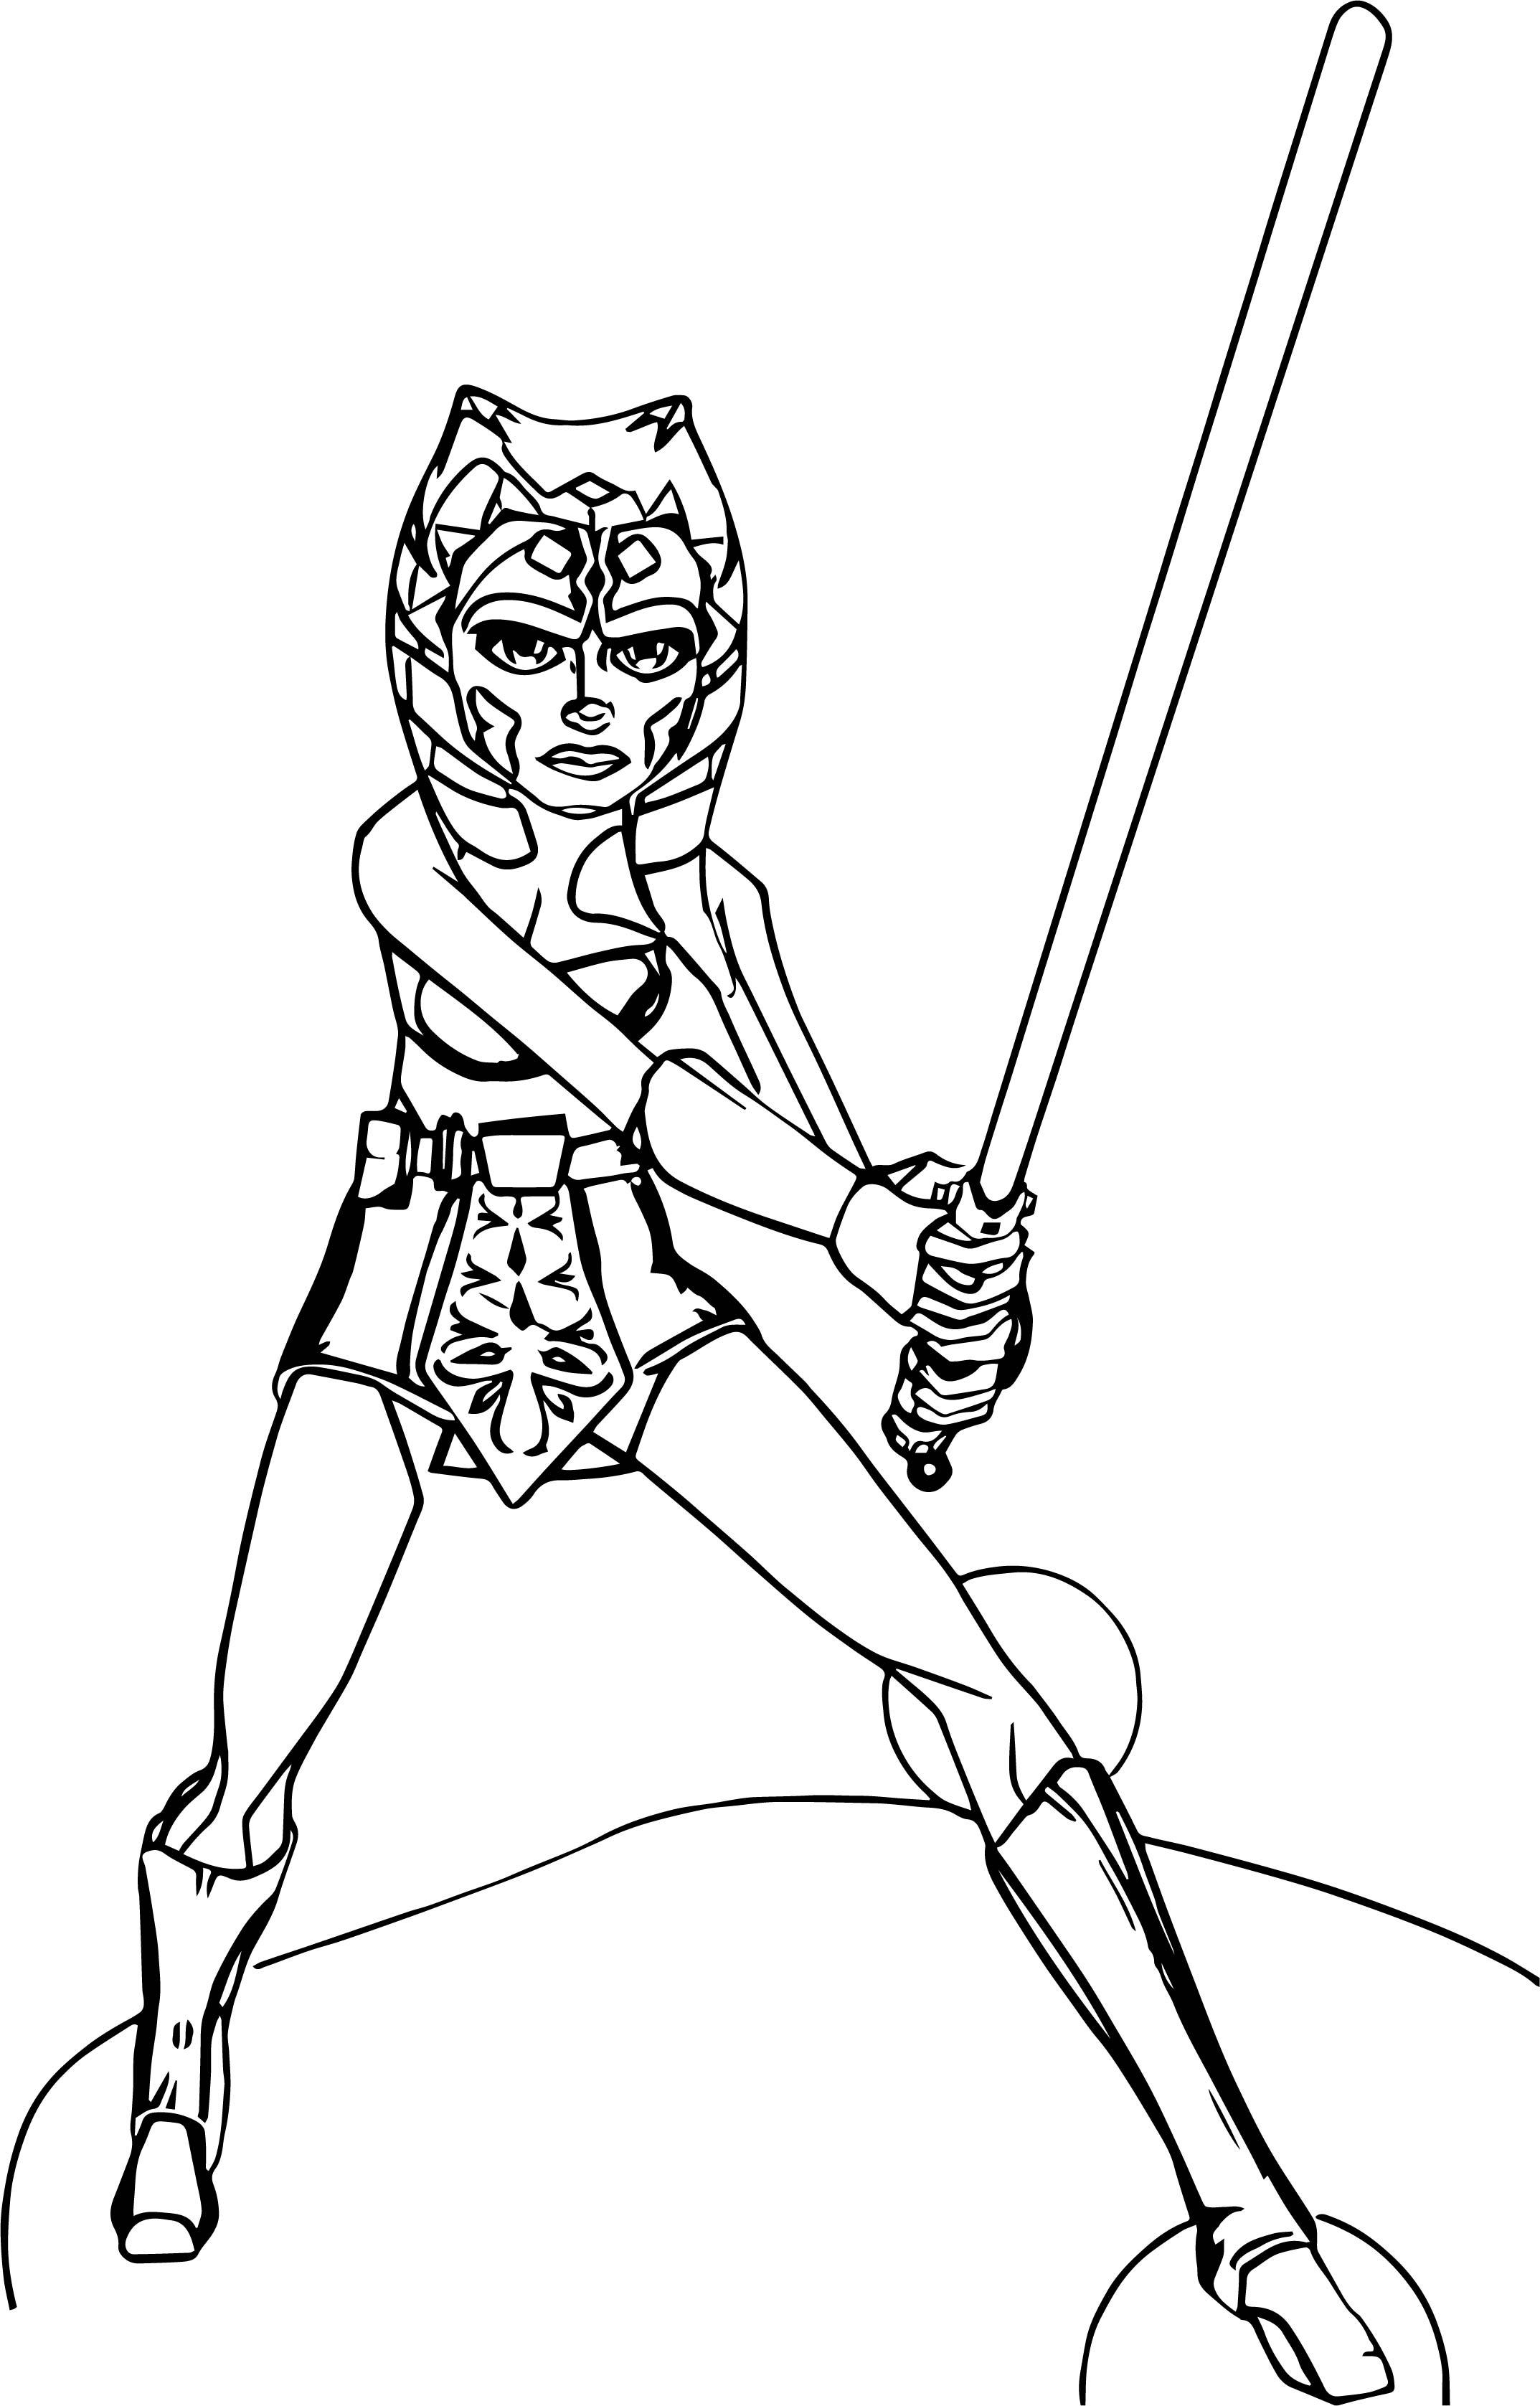 Ahsoka Tano Fighting Pose Coloring Page